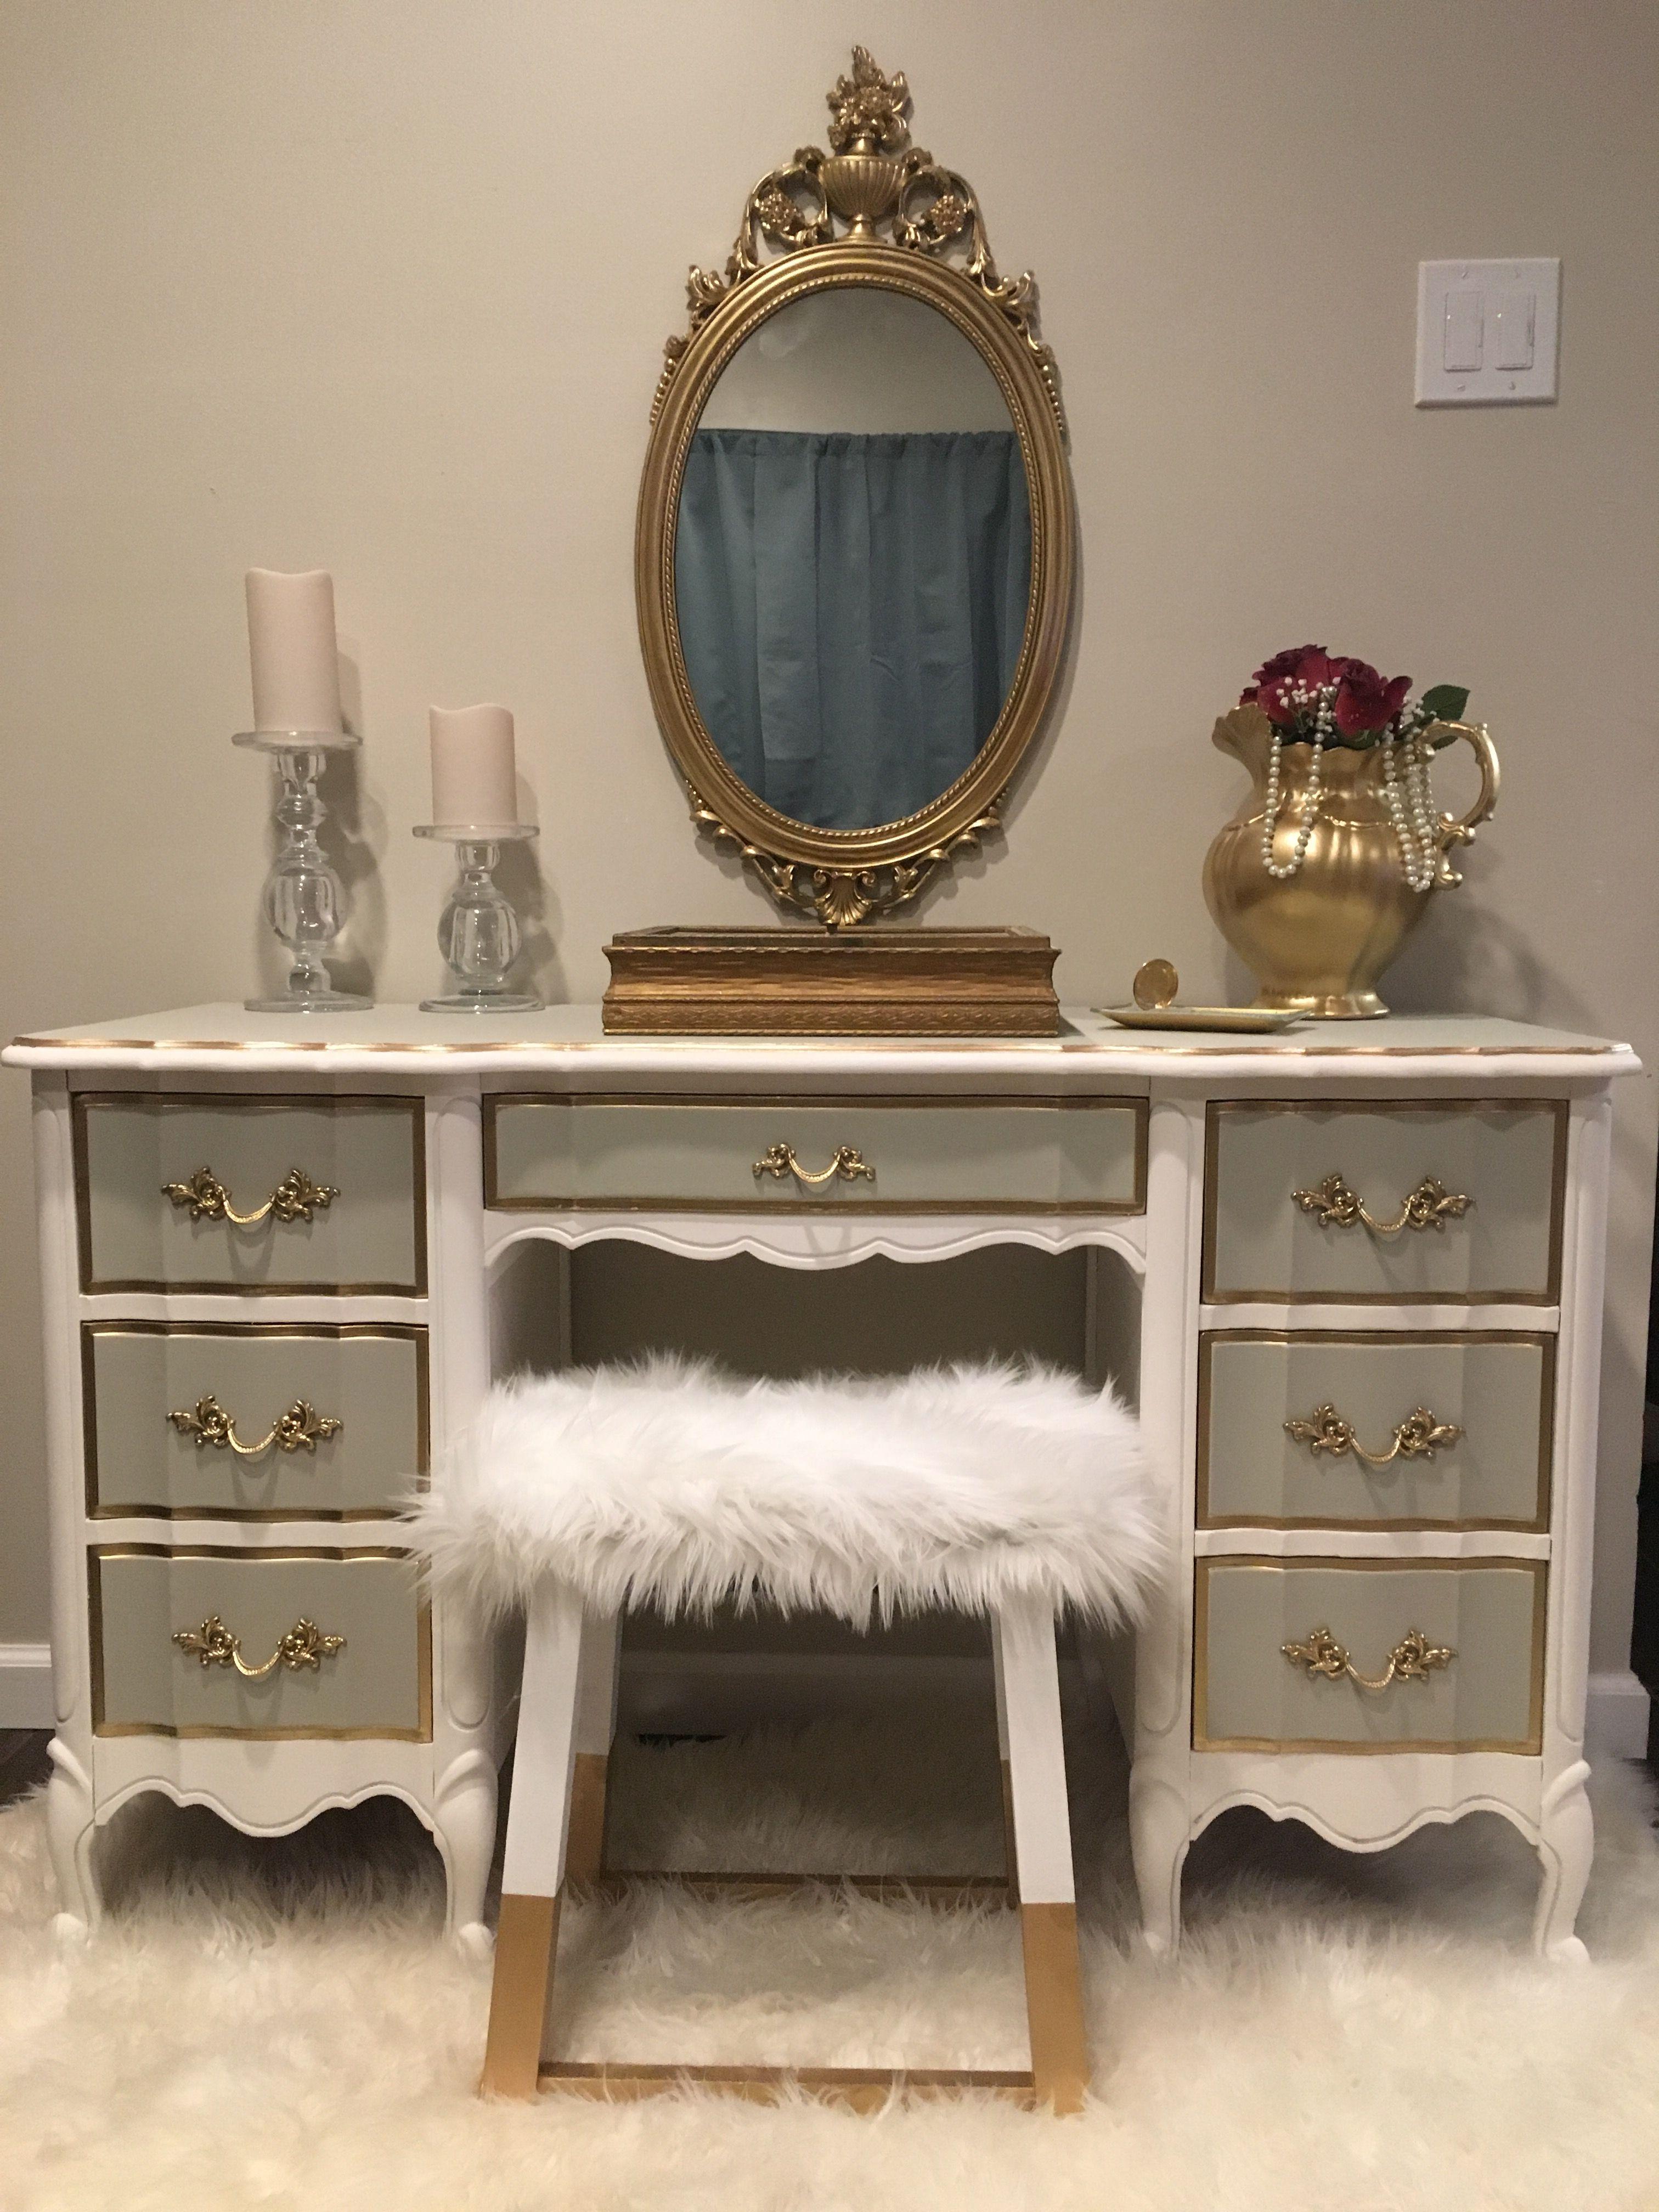 French Provincial Desk In White Gray Gold Vintage French Desk Rustic Furniture Diy Gold Furniture